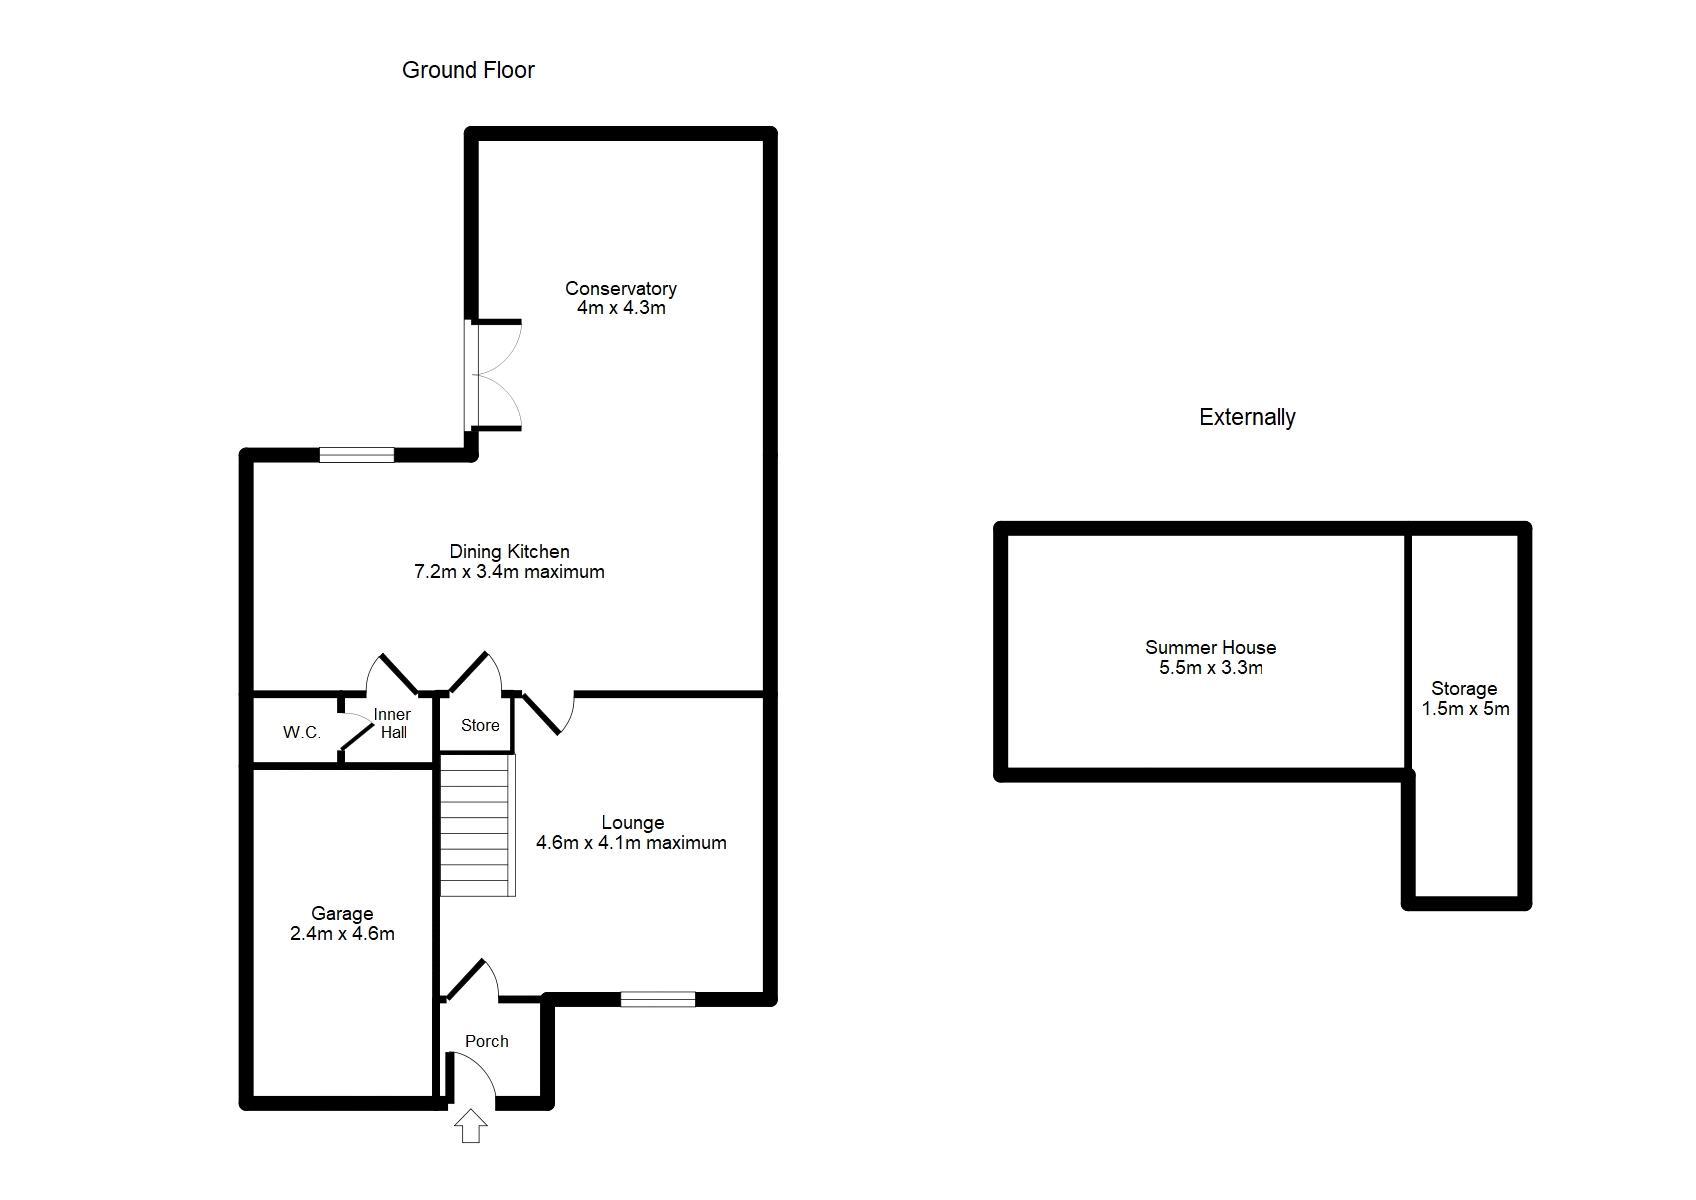 Ground Floor & External Floorplan